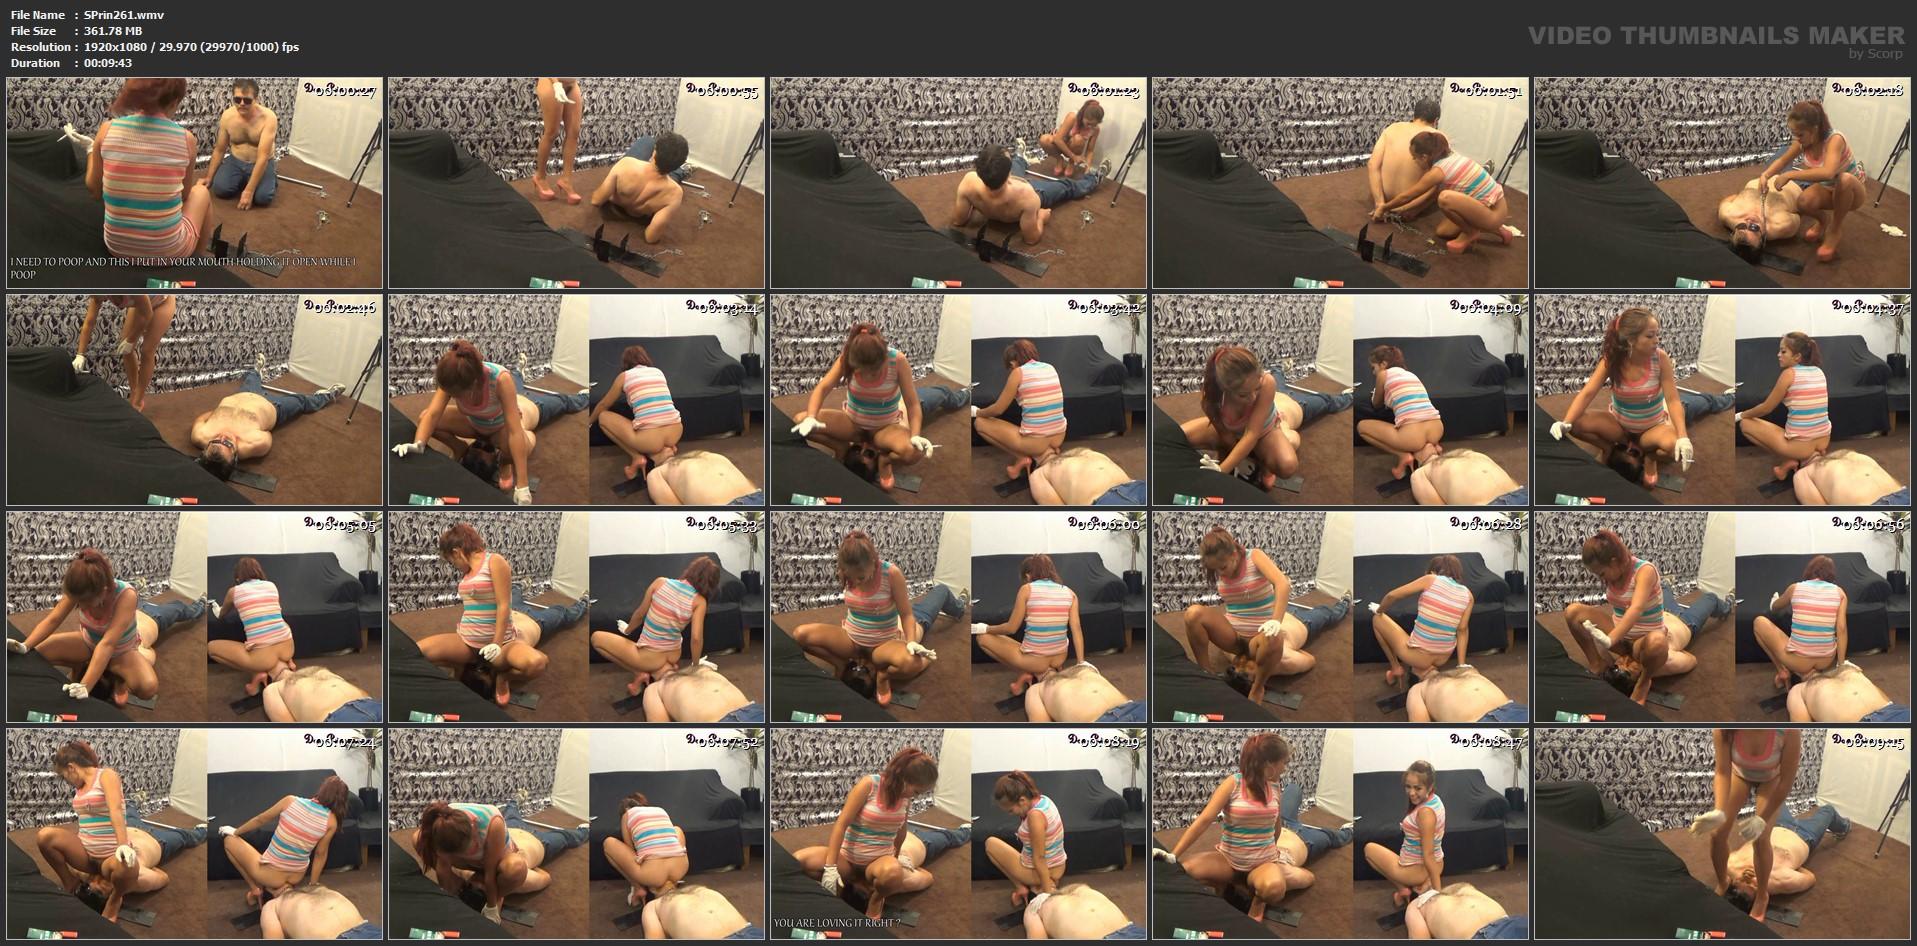 [SCAT-PRINCESS] Protocol Poop Resist Give Up Swallow III Part 5 Karina [FULL HD][1080p][WMV]